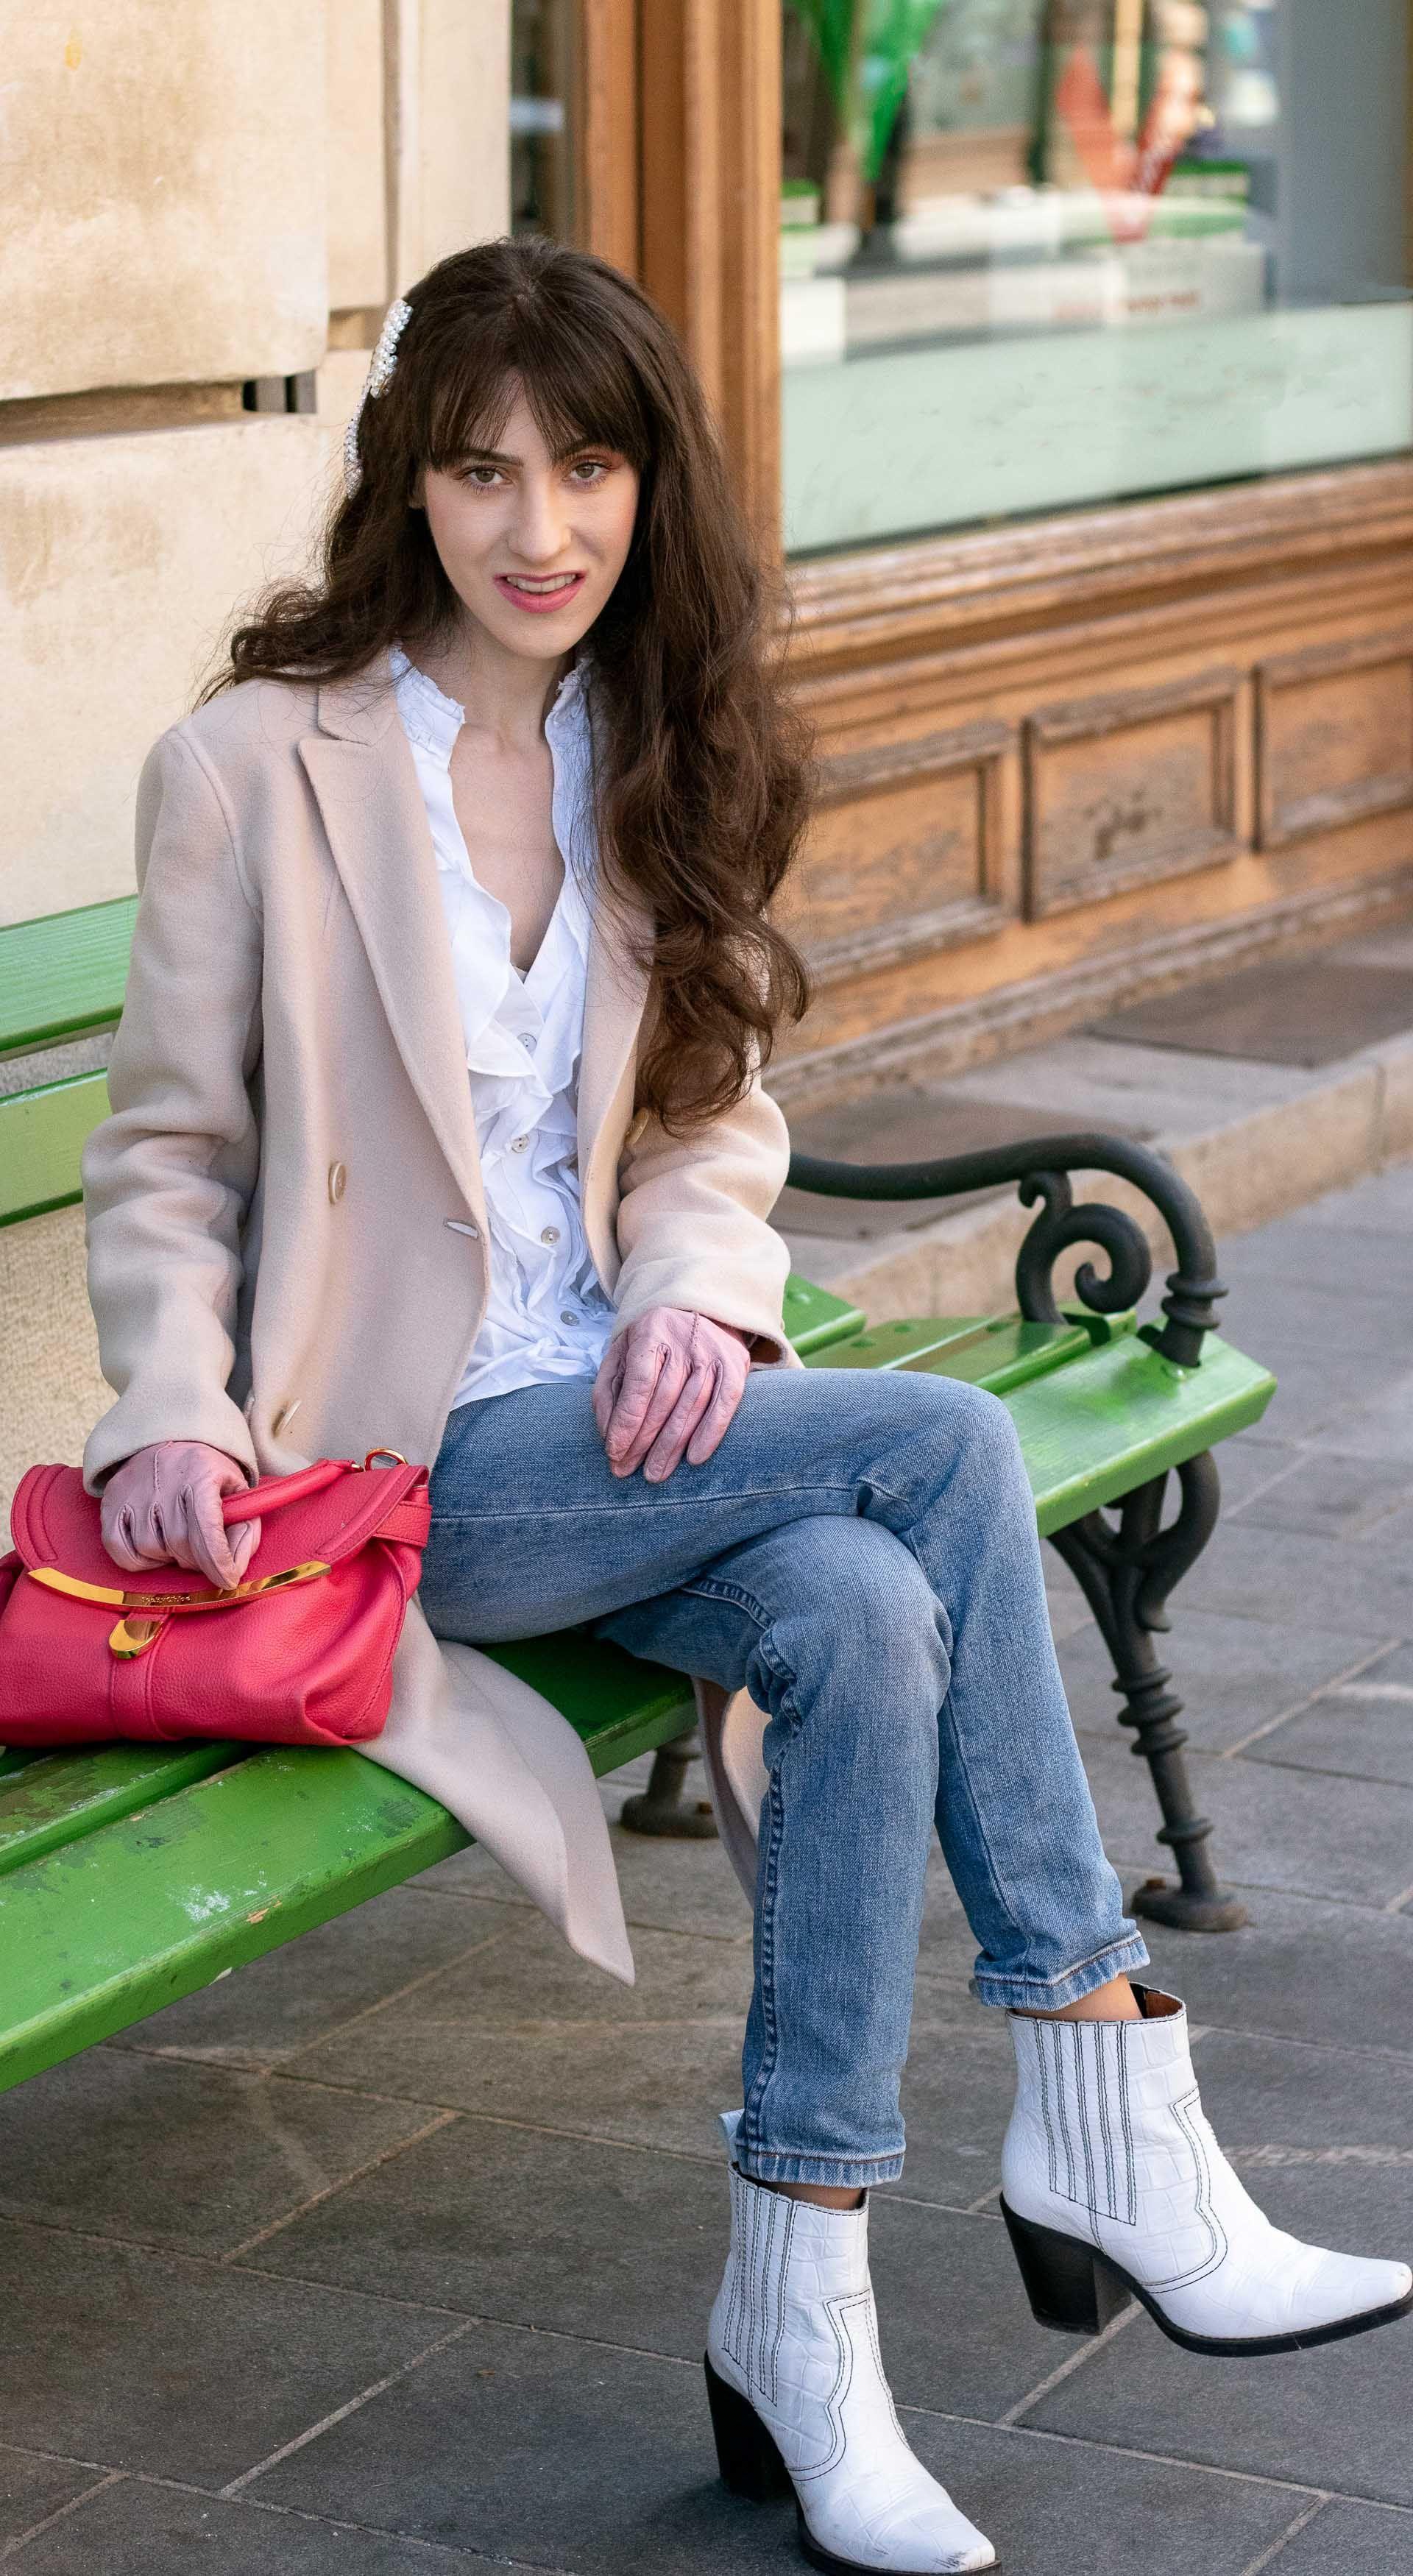 eeb1a3c8 Must follow Slovenian Fashion Blogger Veronika Lipar of Brunette from Wall  Street wearing white cowboy Ganni